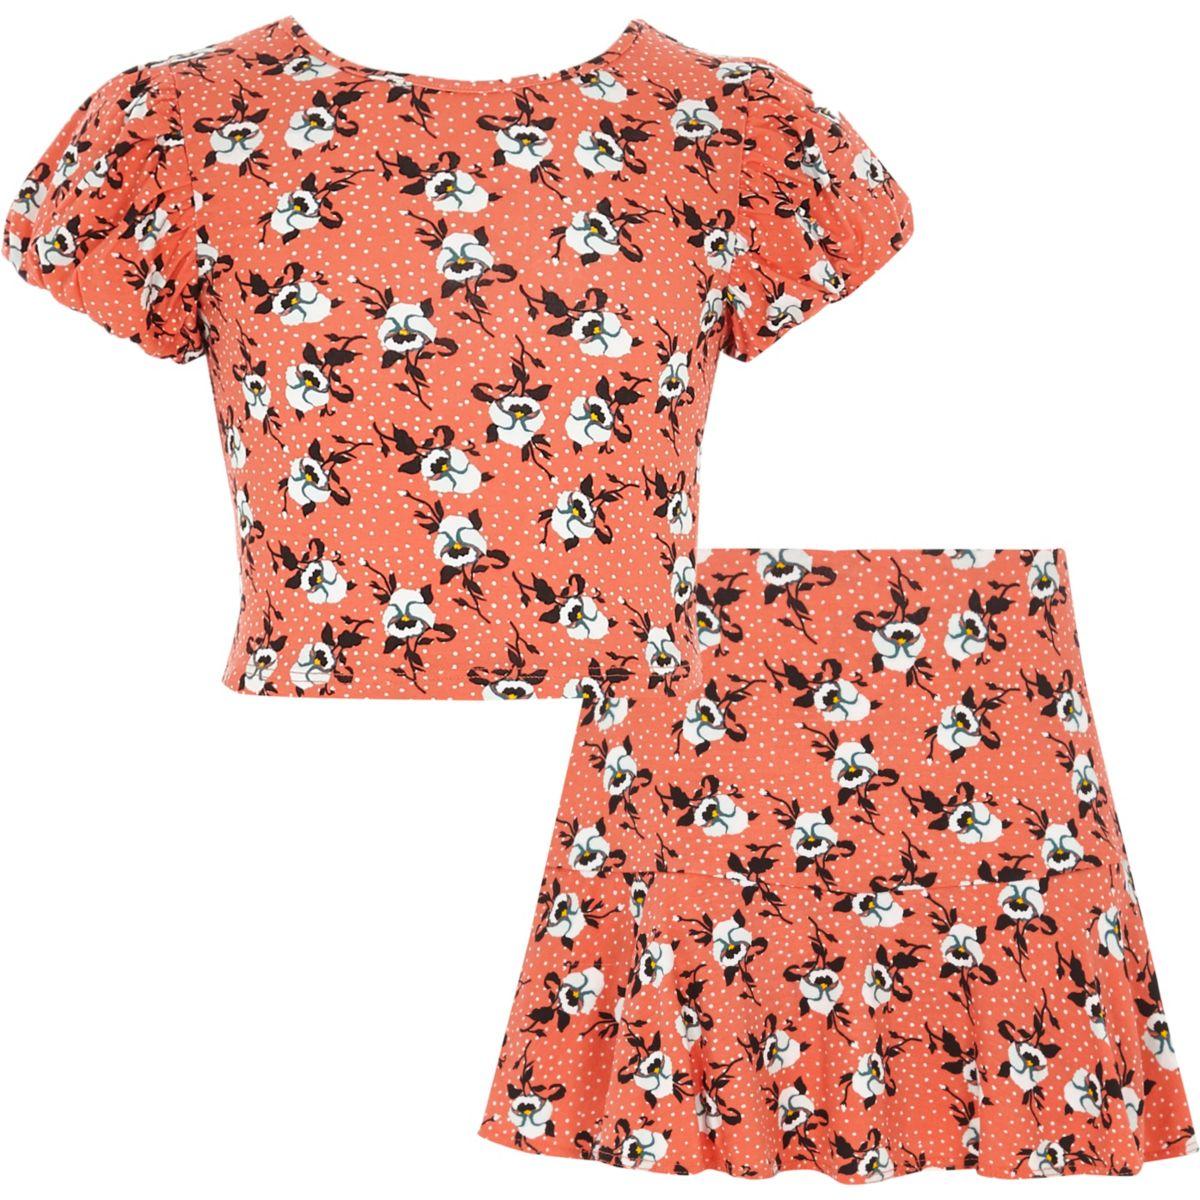 Girls orange floral crop top and skort outfit